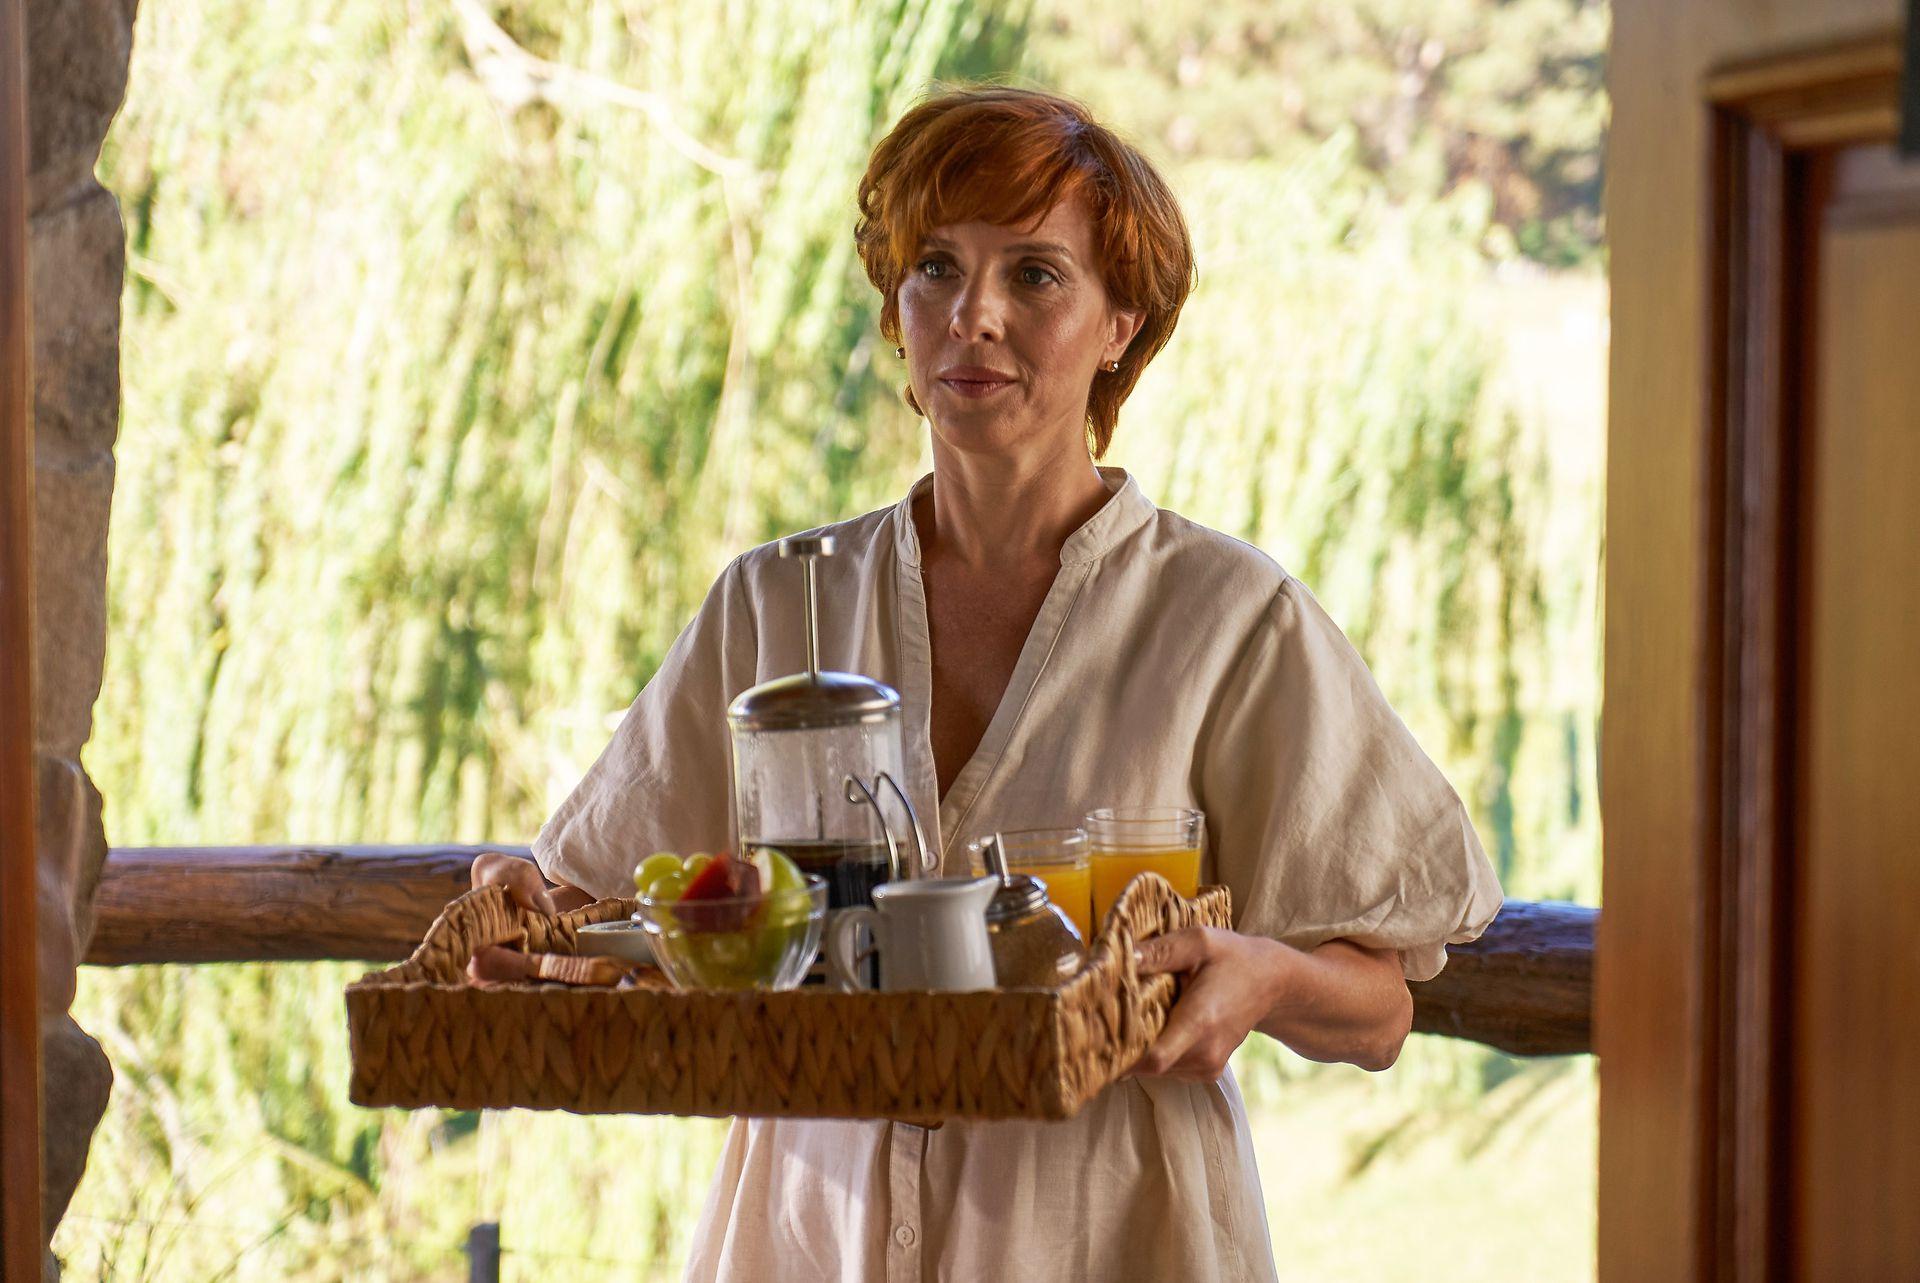 Carla Peterson interpreta a Selva, una excéntrica terapeuta